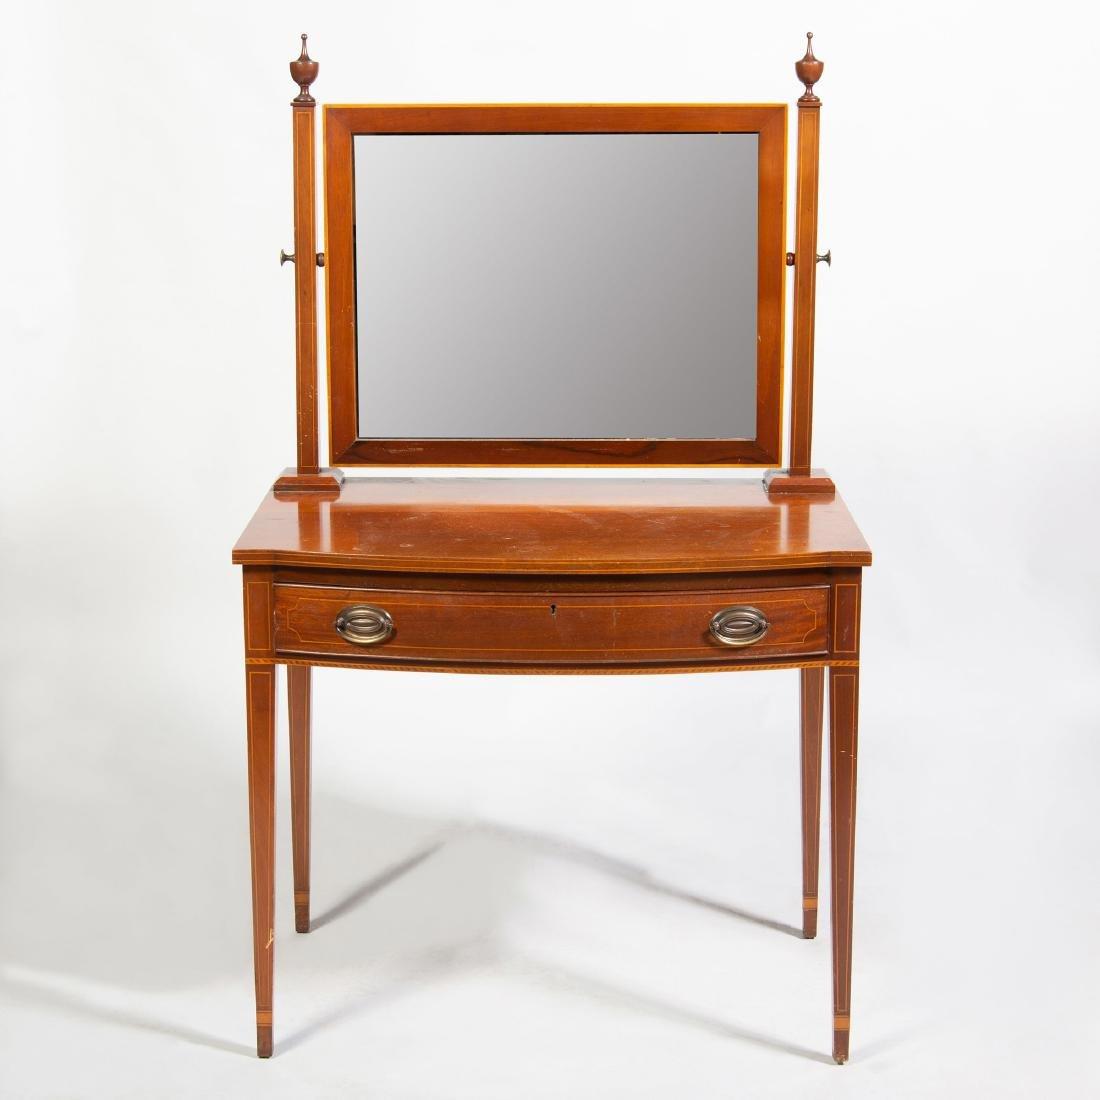 George III Style Inlaid Mahogany Dressing Table